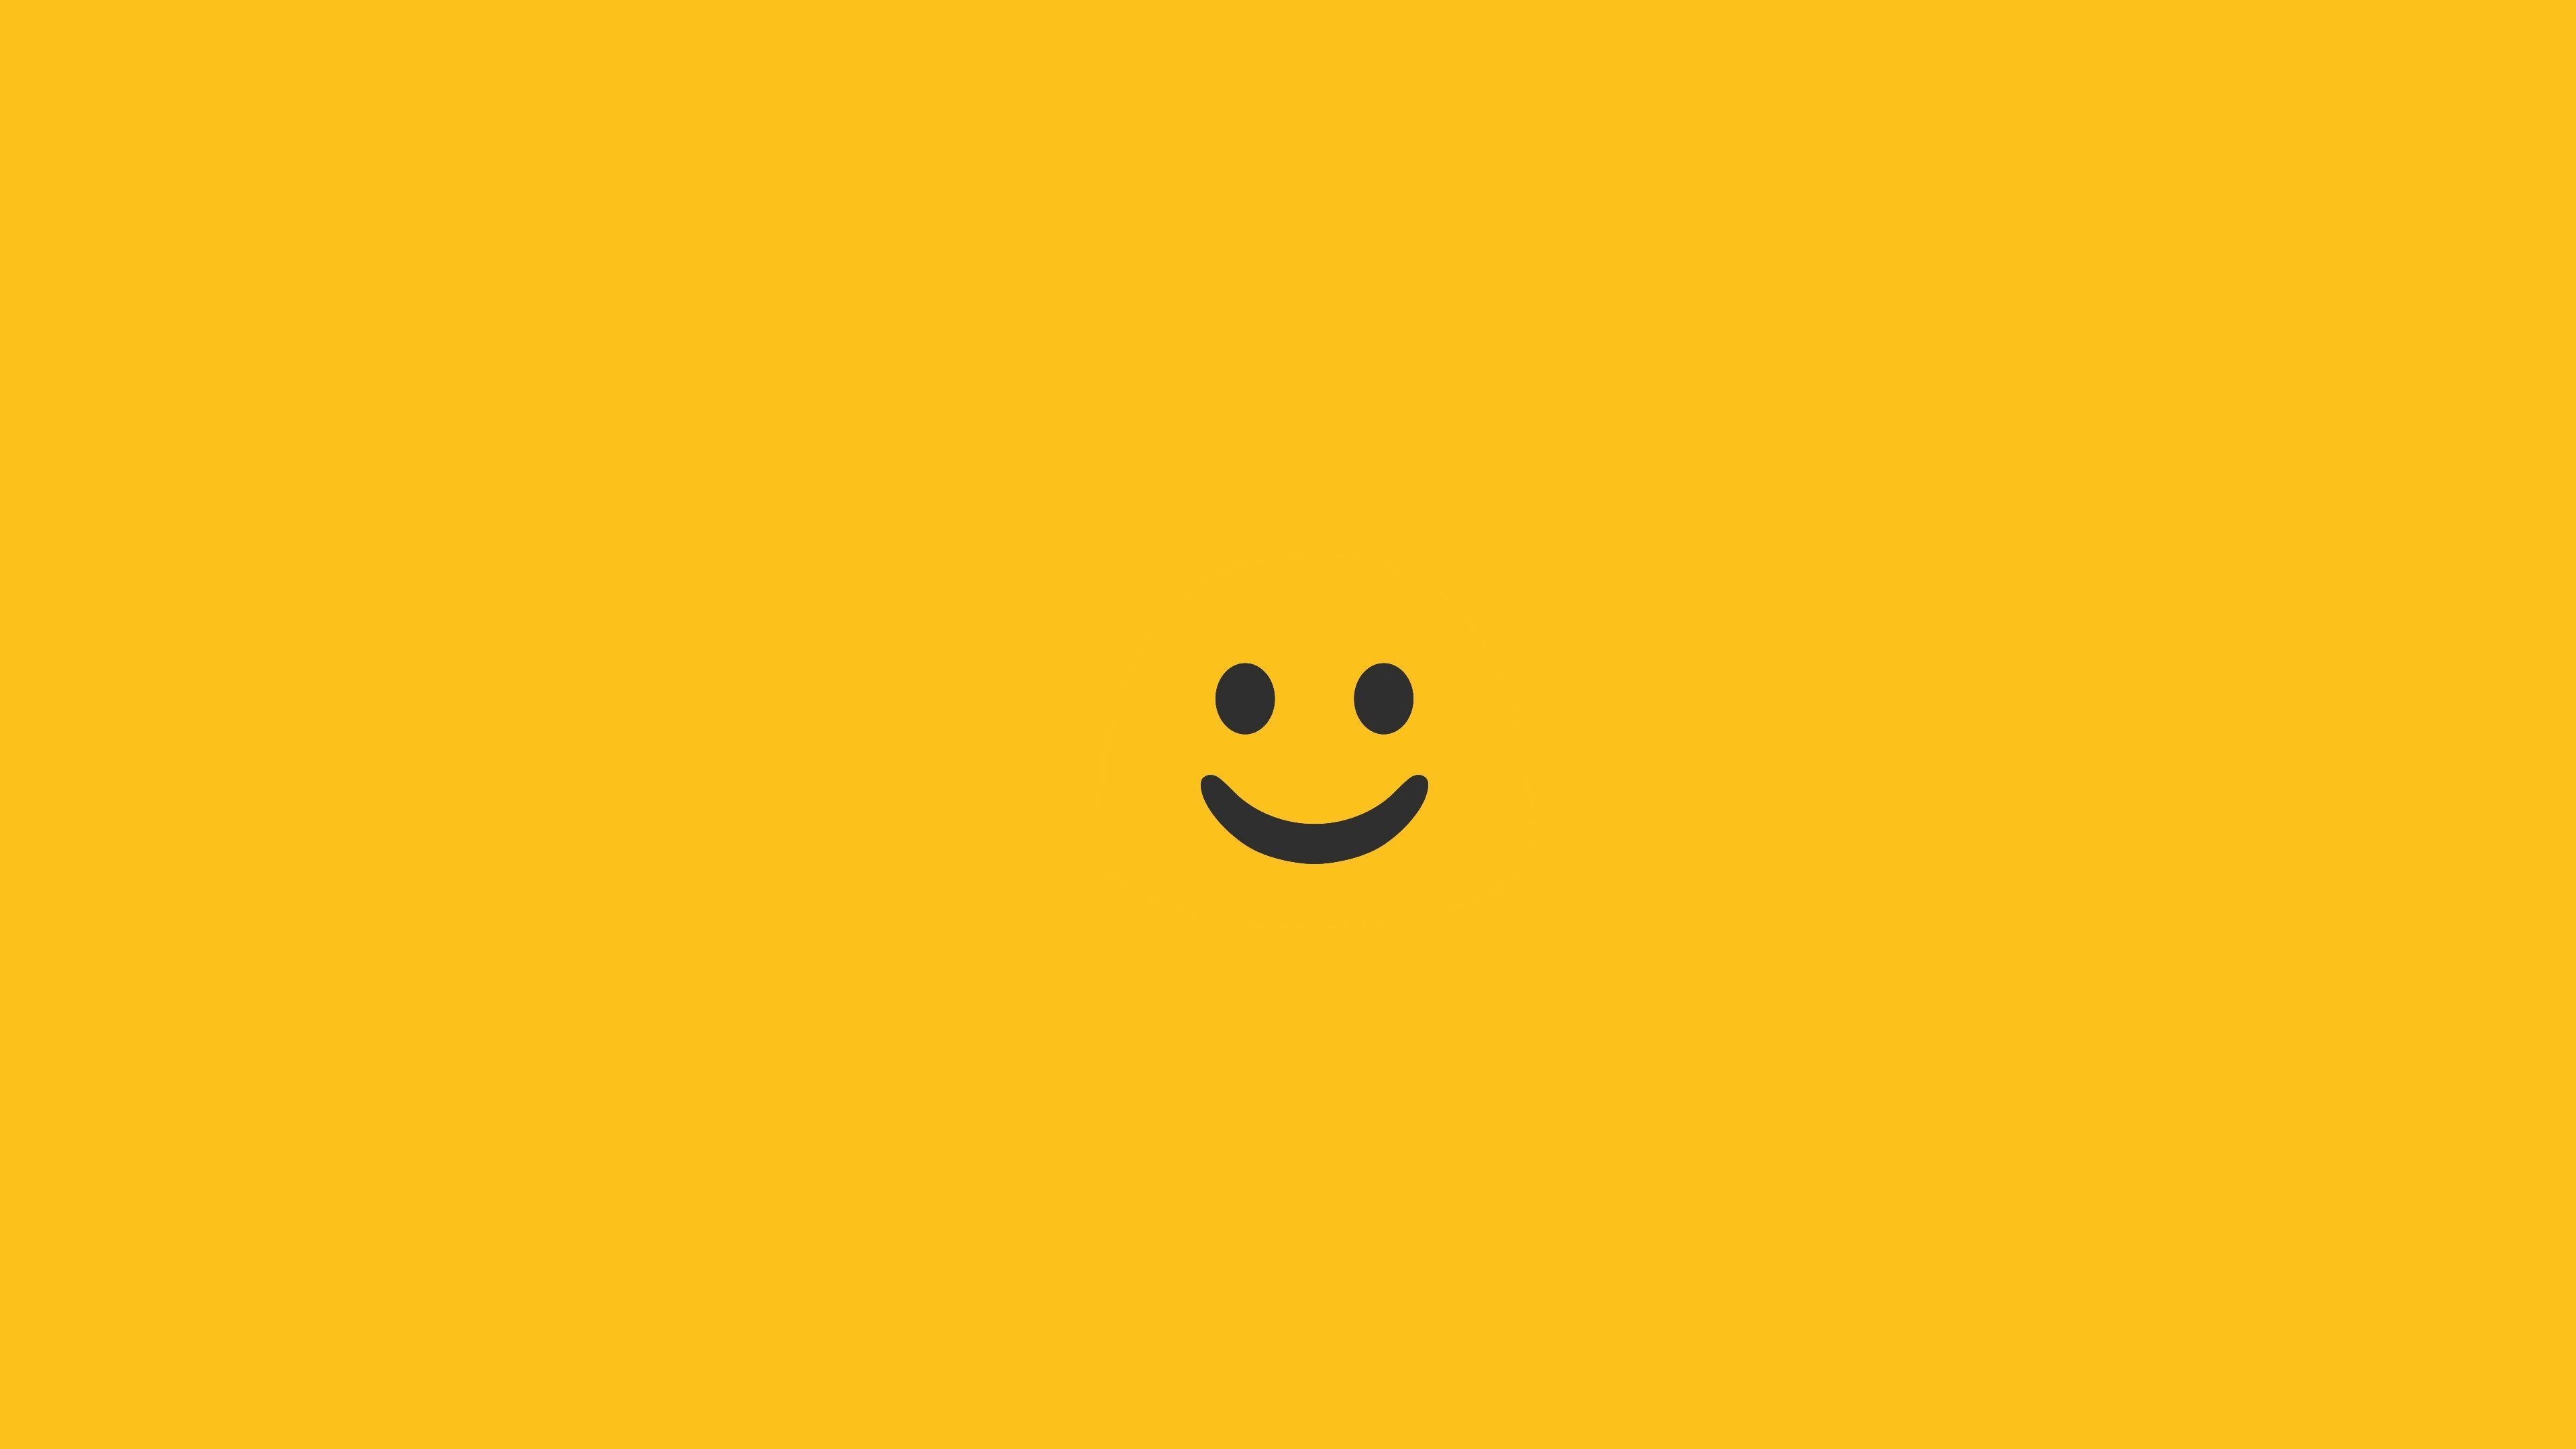 Emoji Wallpapers - Top Free Emoji Backgrounds ...